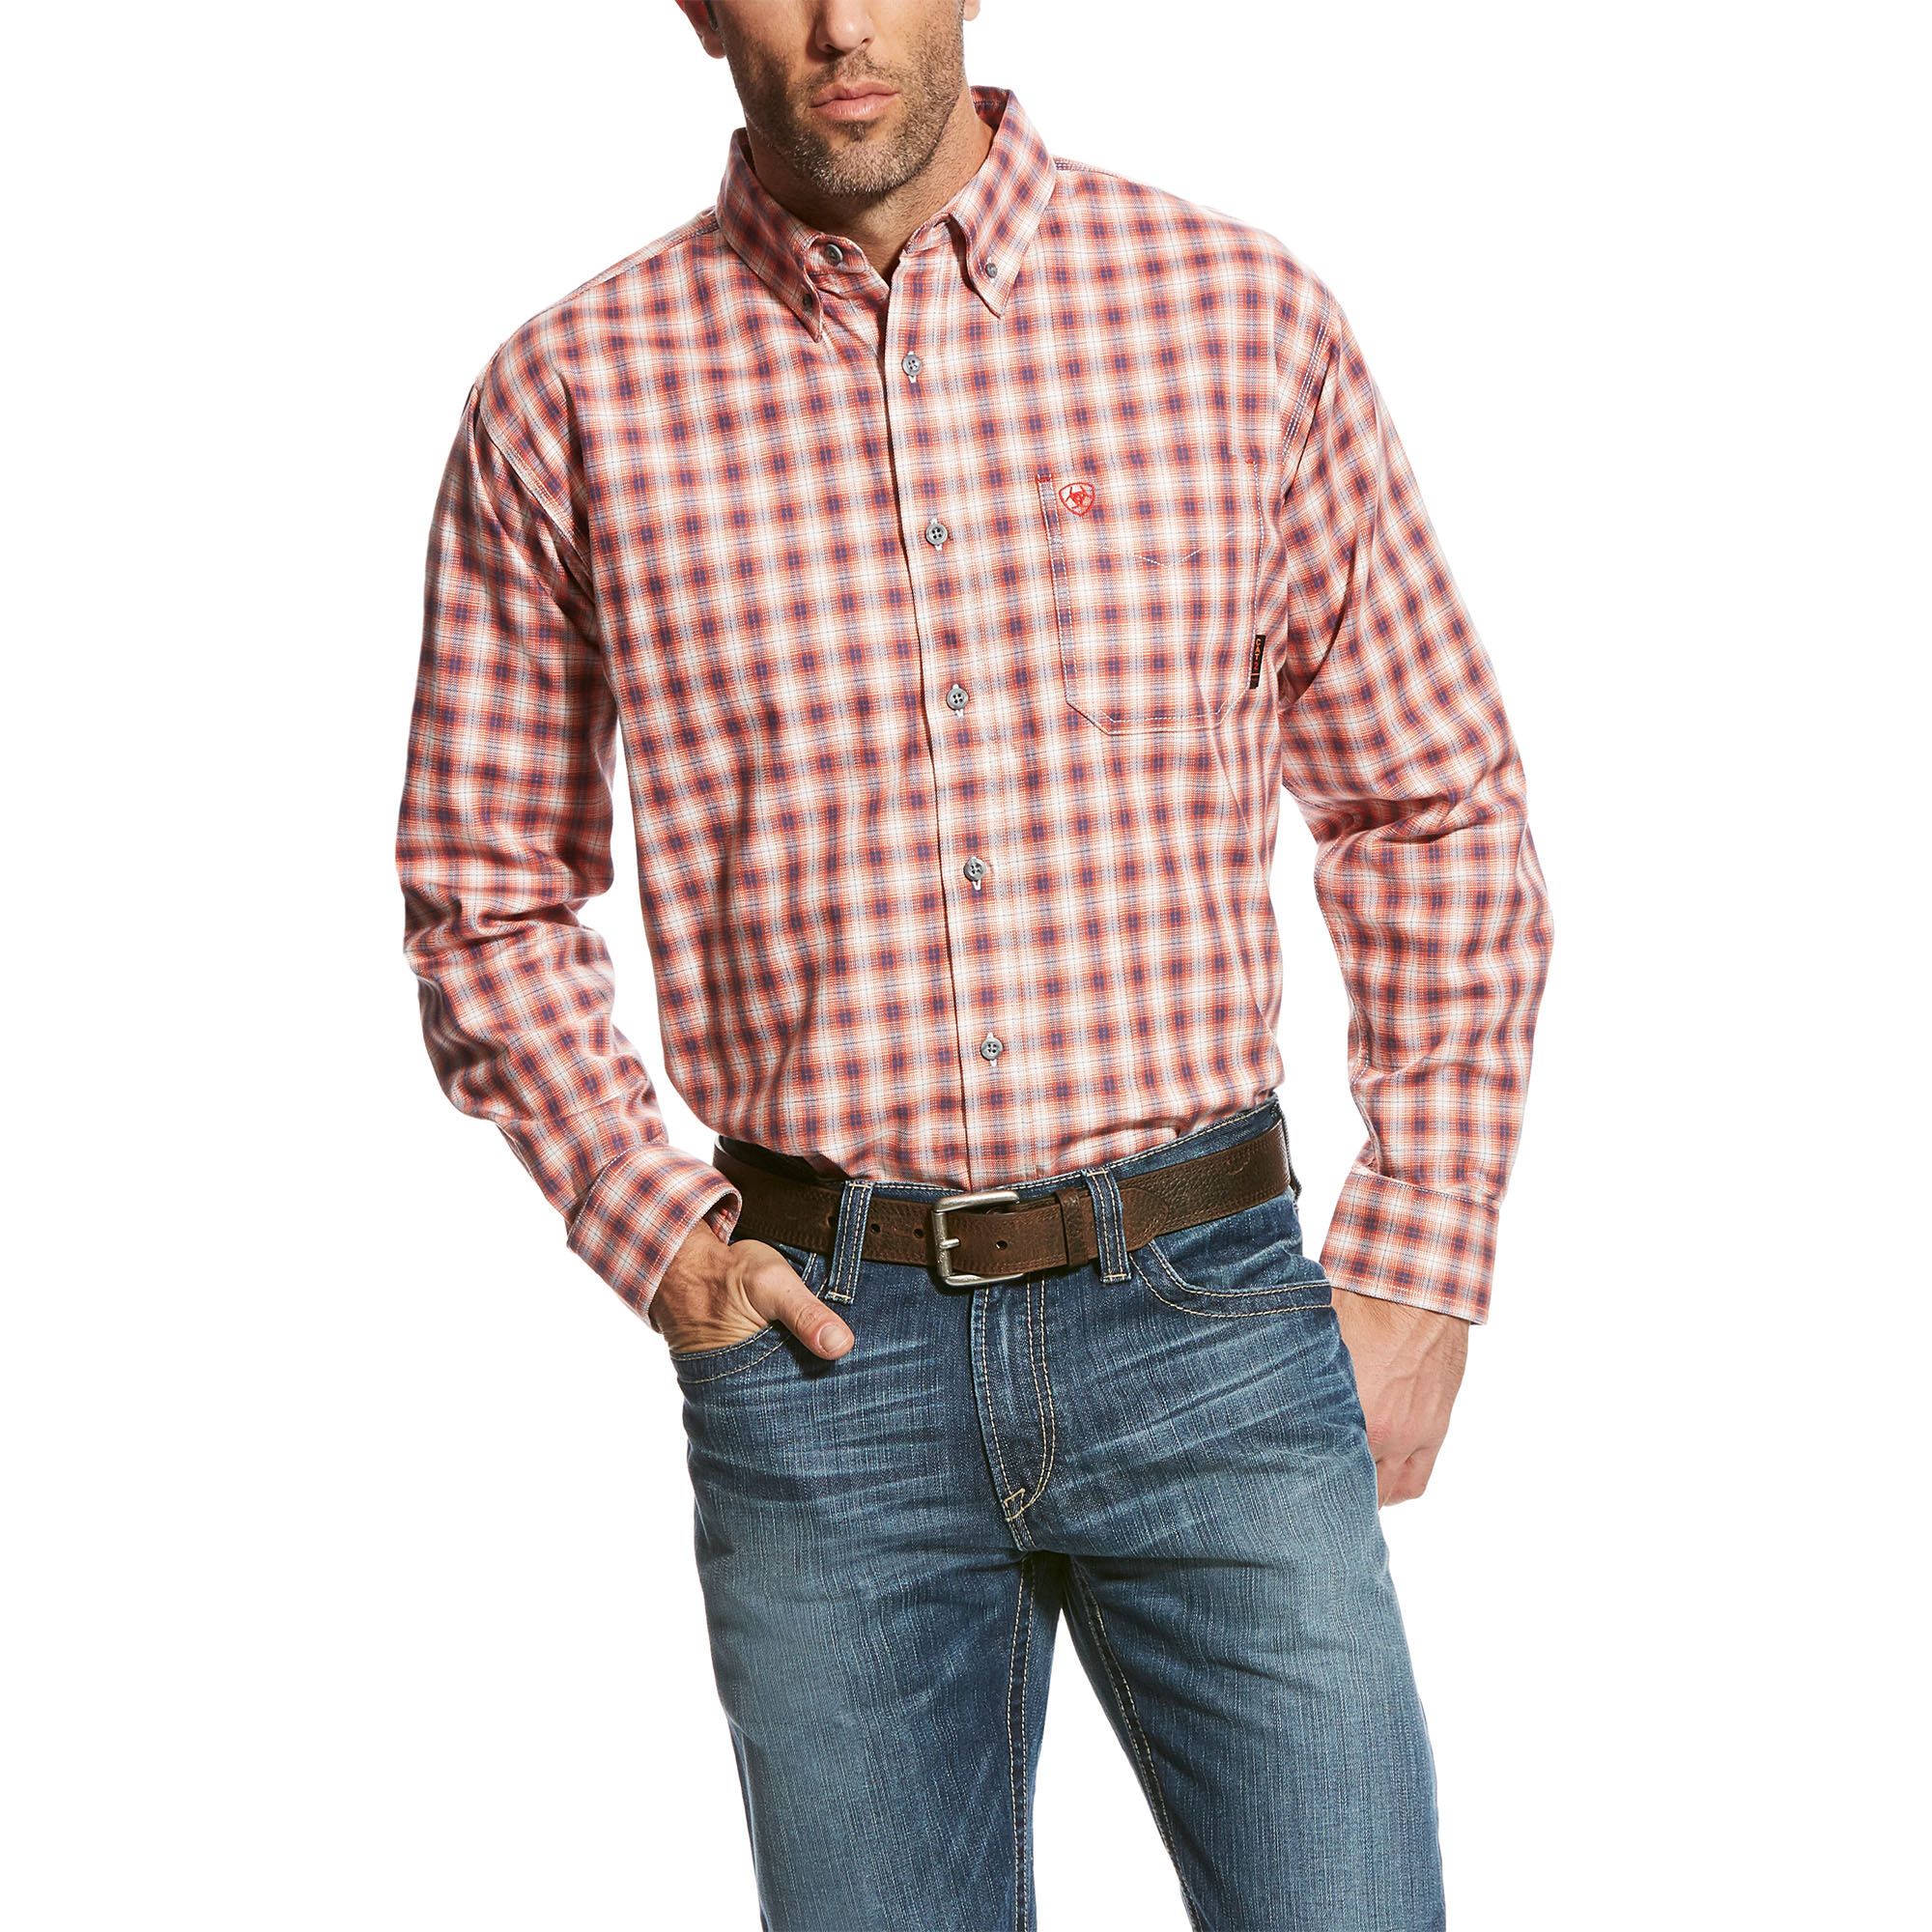 FR Lundy Work Shirt